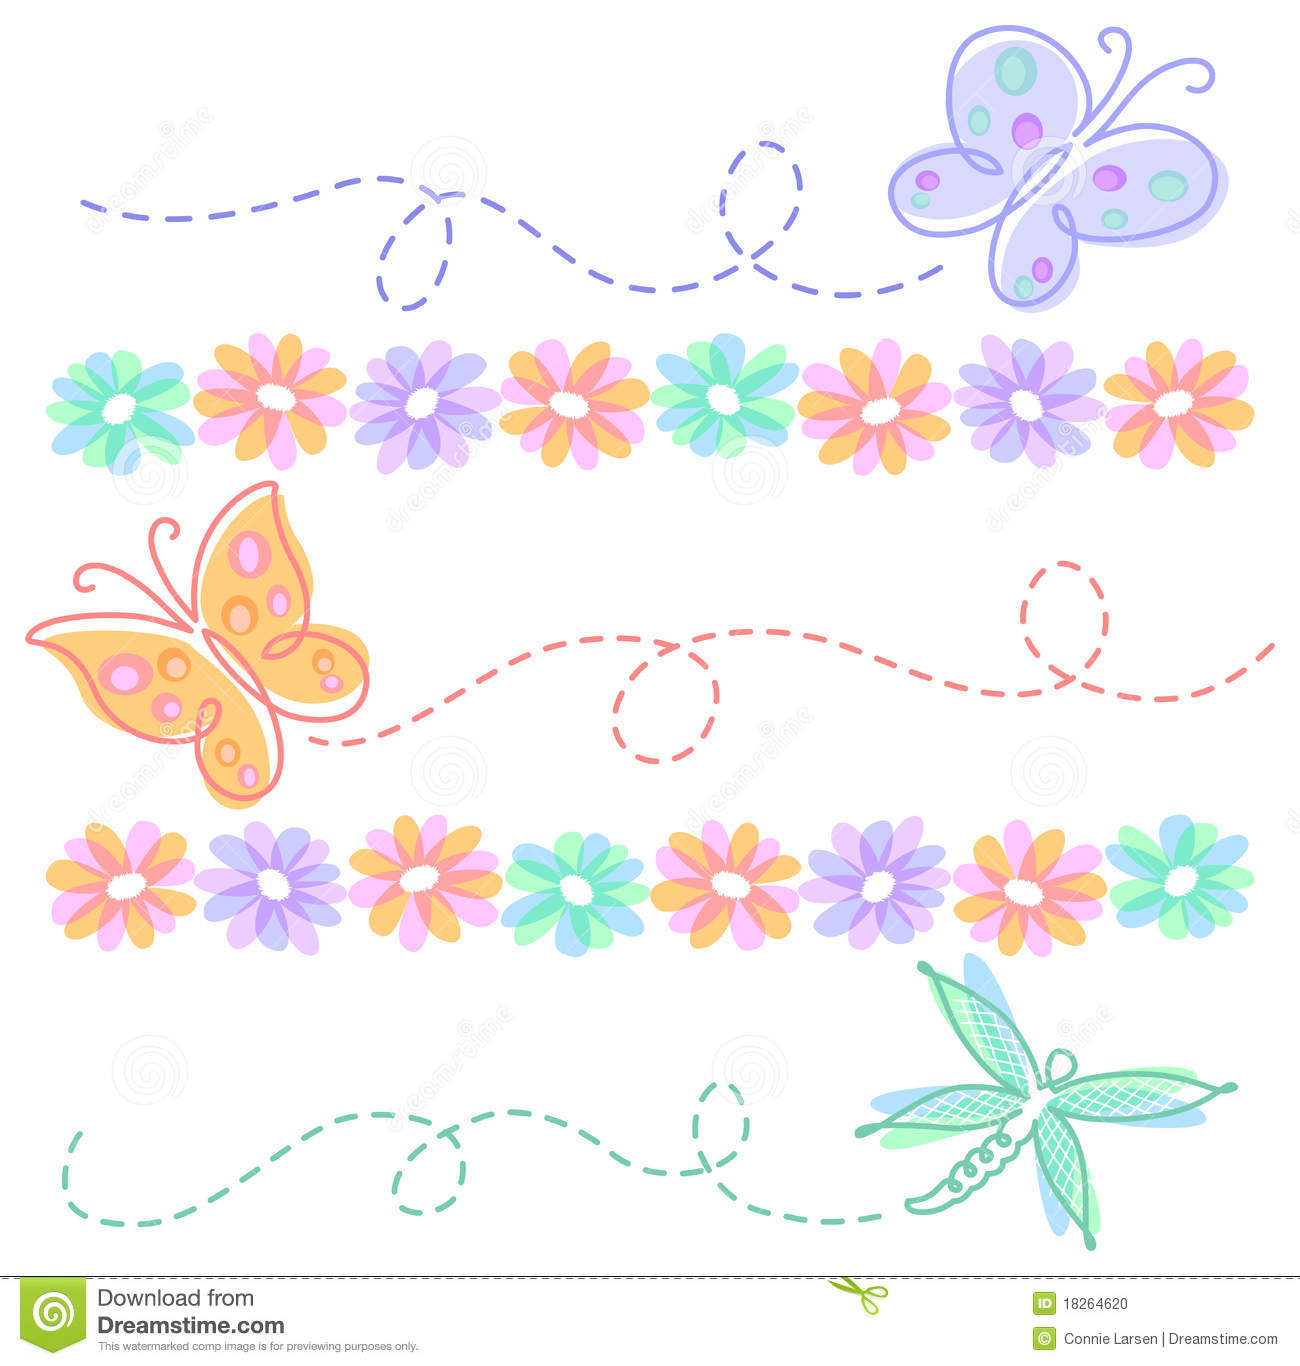 Cool Frame Clipart Flowers And Butterflies Border Clipart Panda